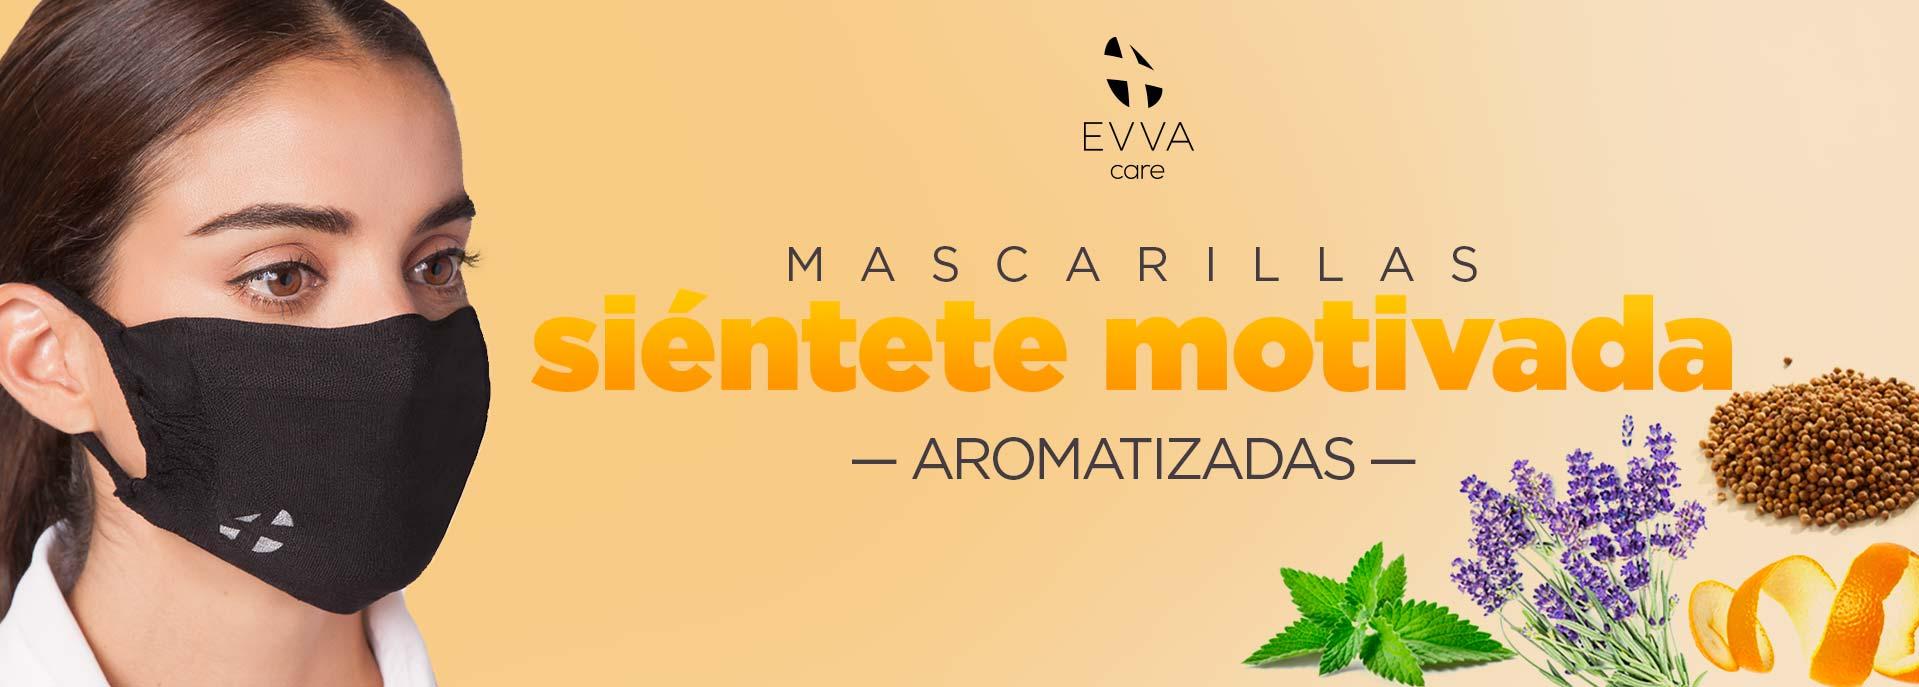 evva-jeans-section-banner-mascarillas-motivacion